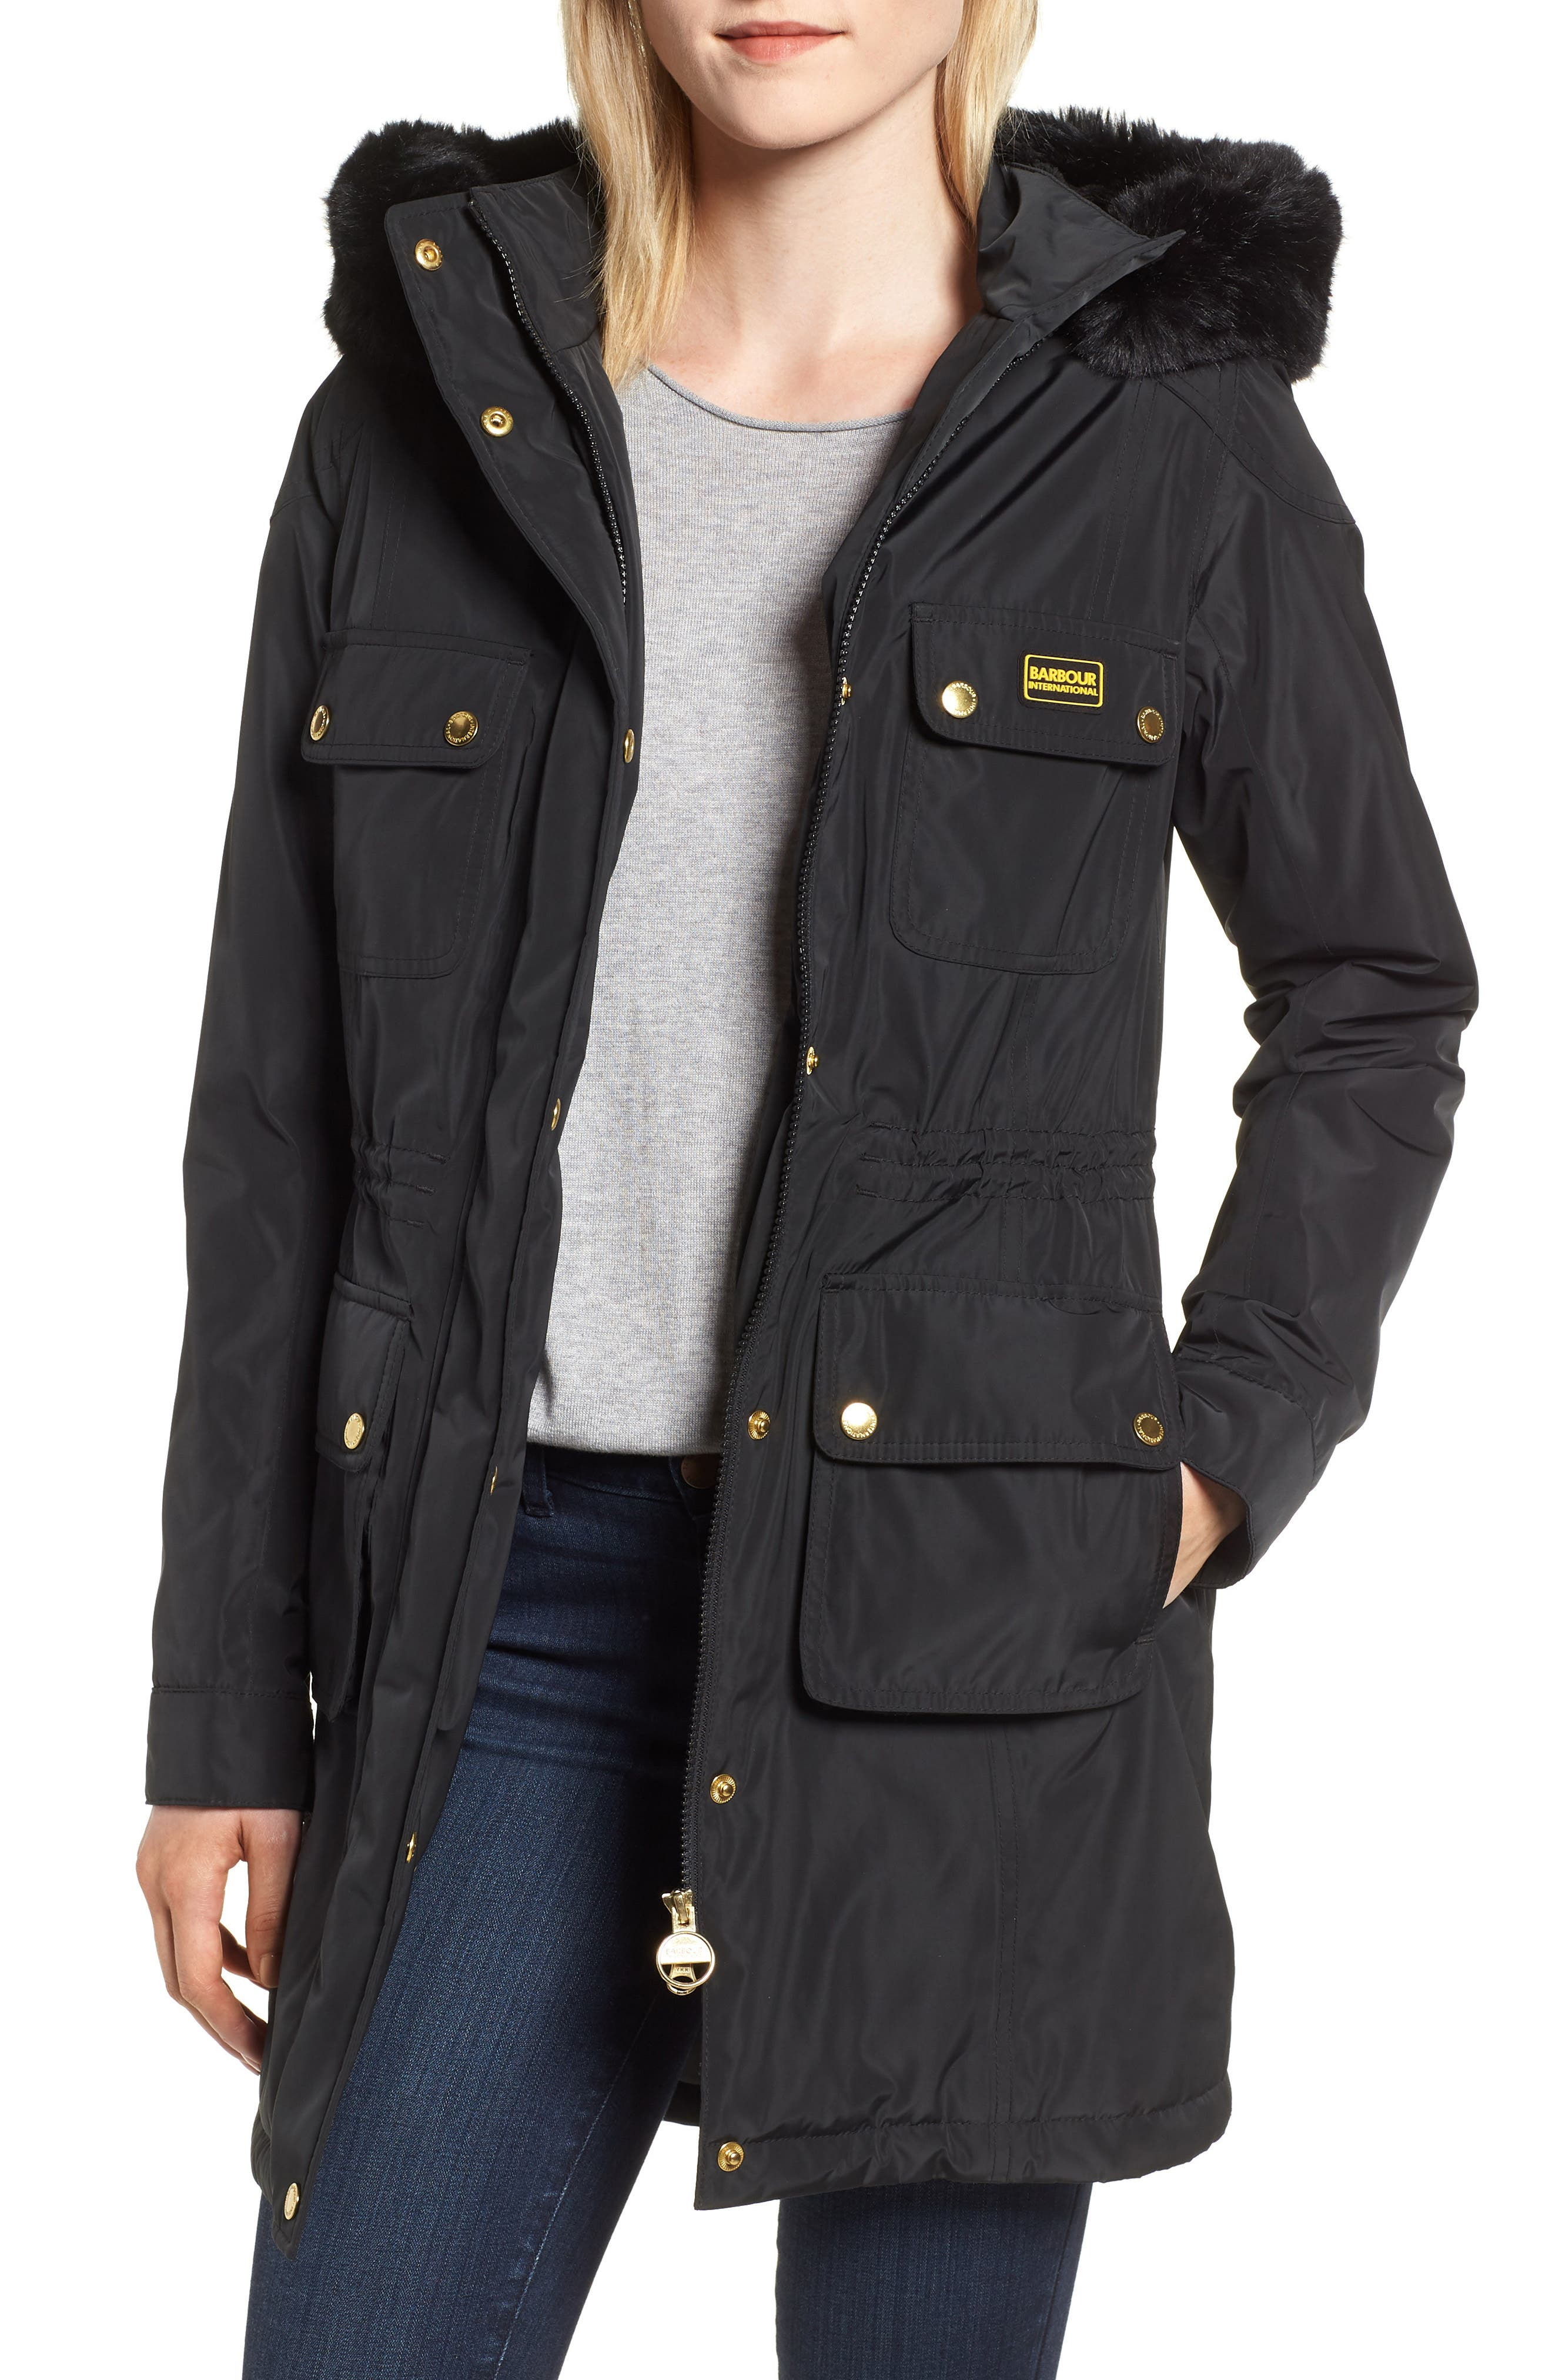 Barbour Imatra Waterproof Jacket With Faux Fur Trim, US / 8 UK - Black